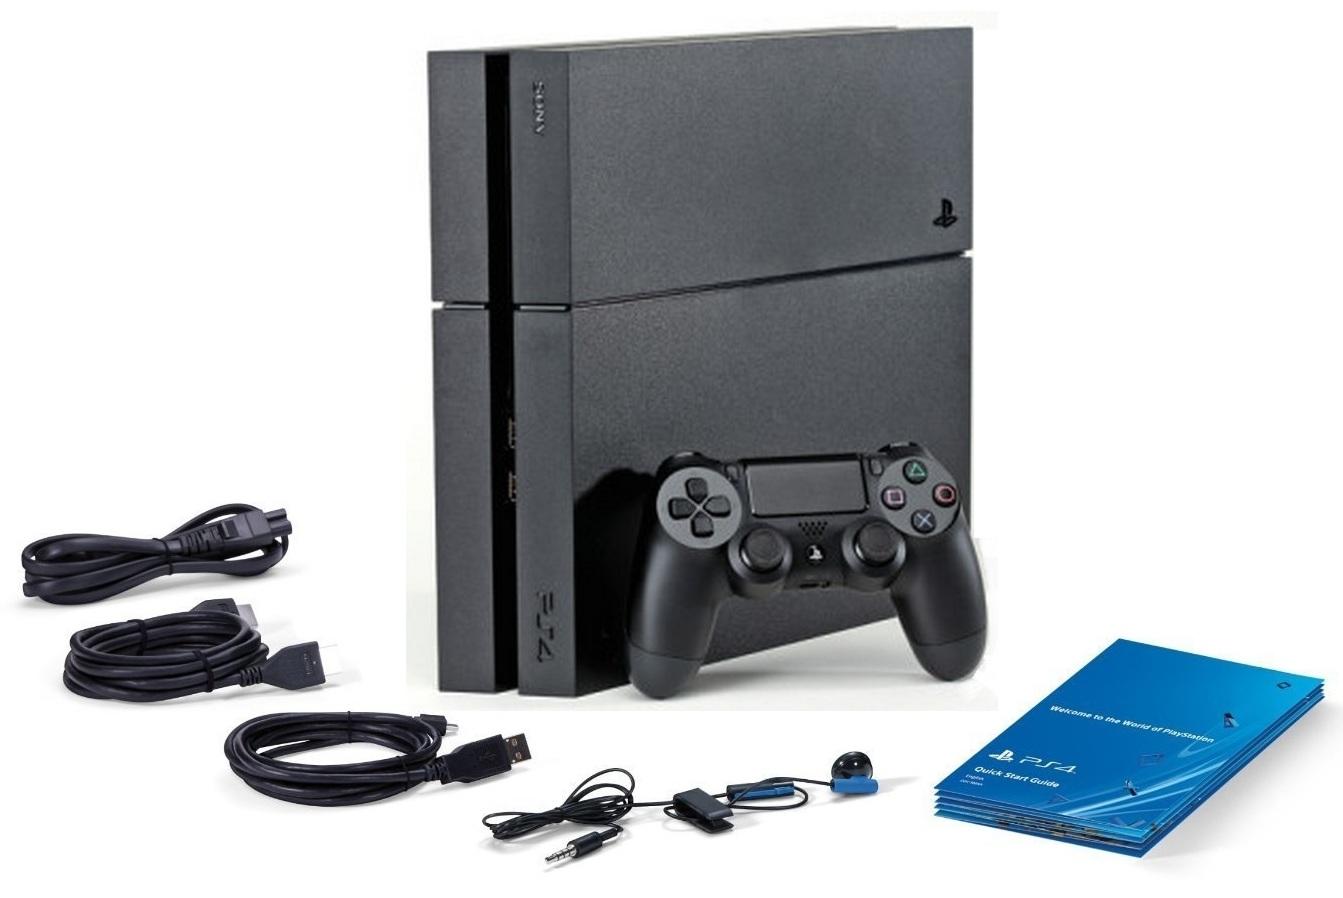 PS4 contents